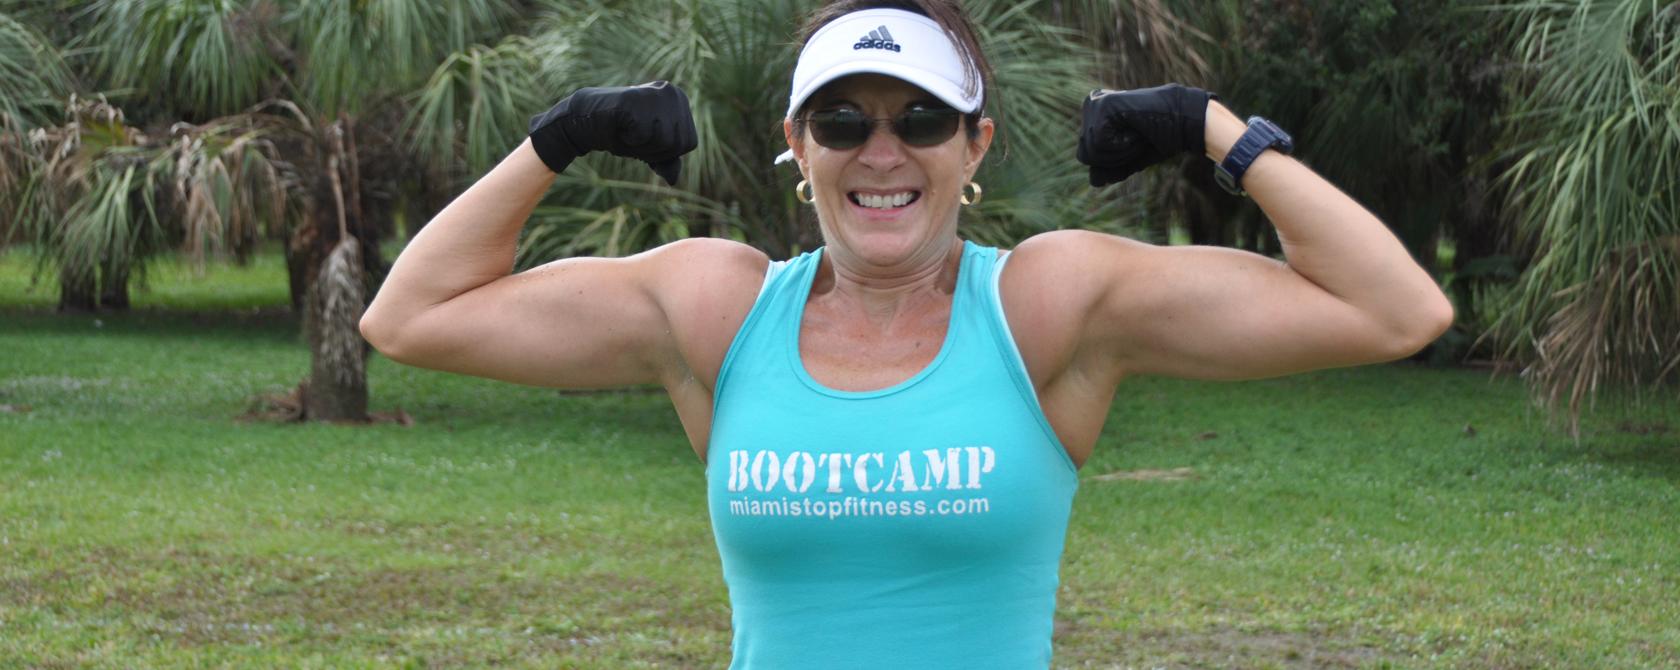 boot camper muscle Mass